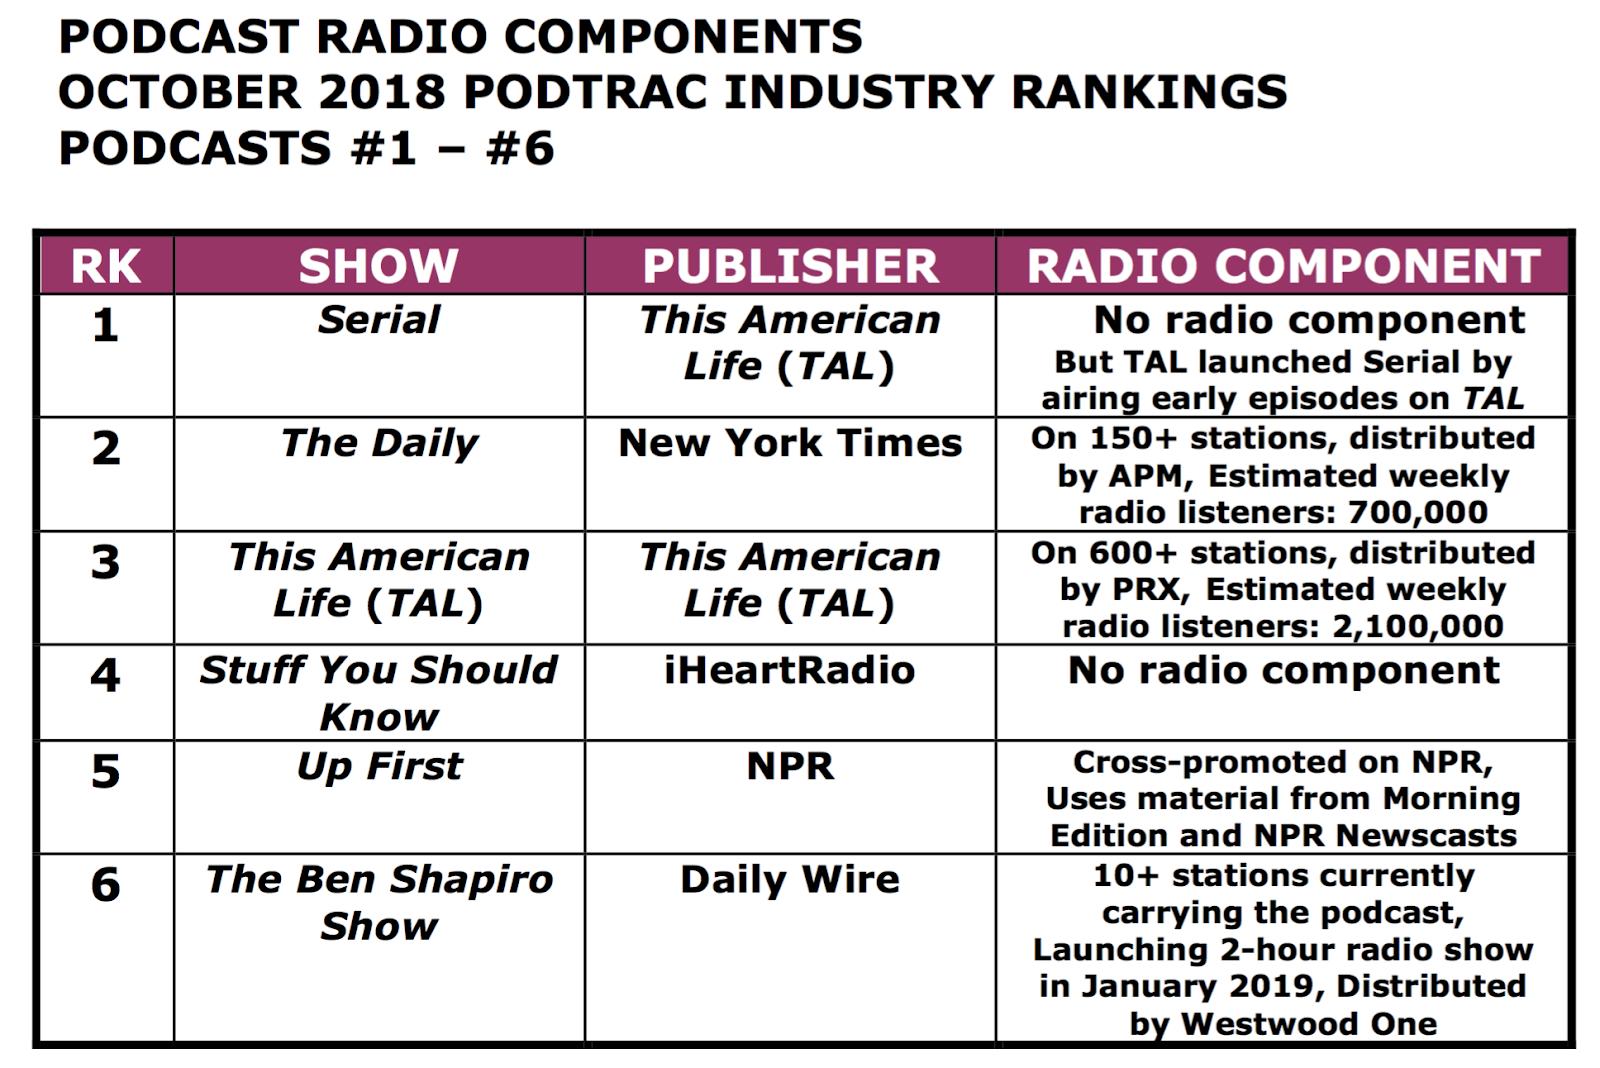 SPARK NEWS: PODCAST + RADIO = SUCCESS